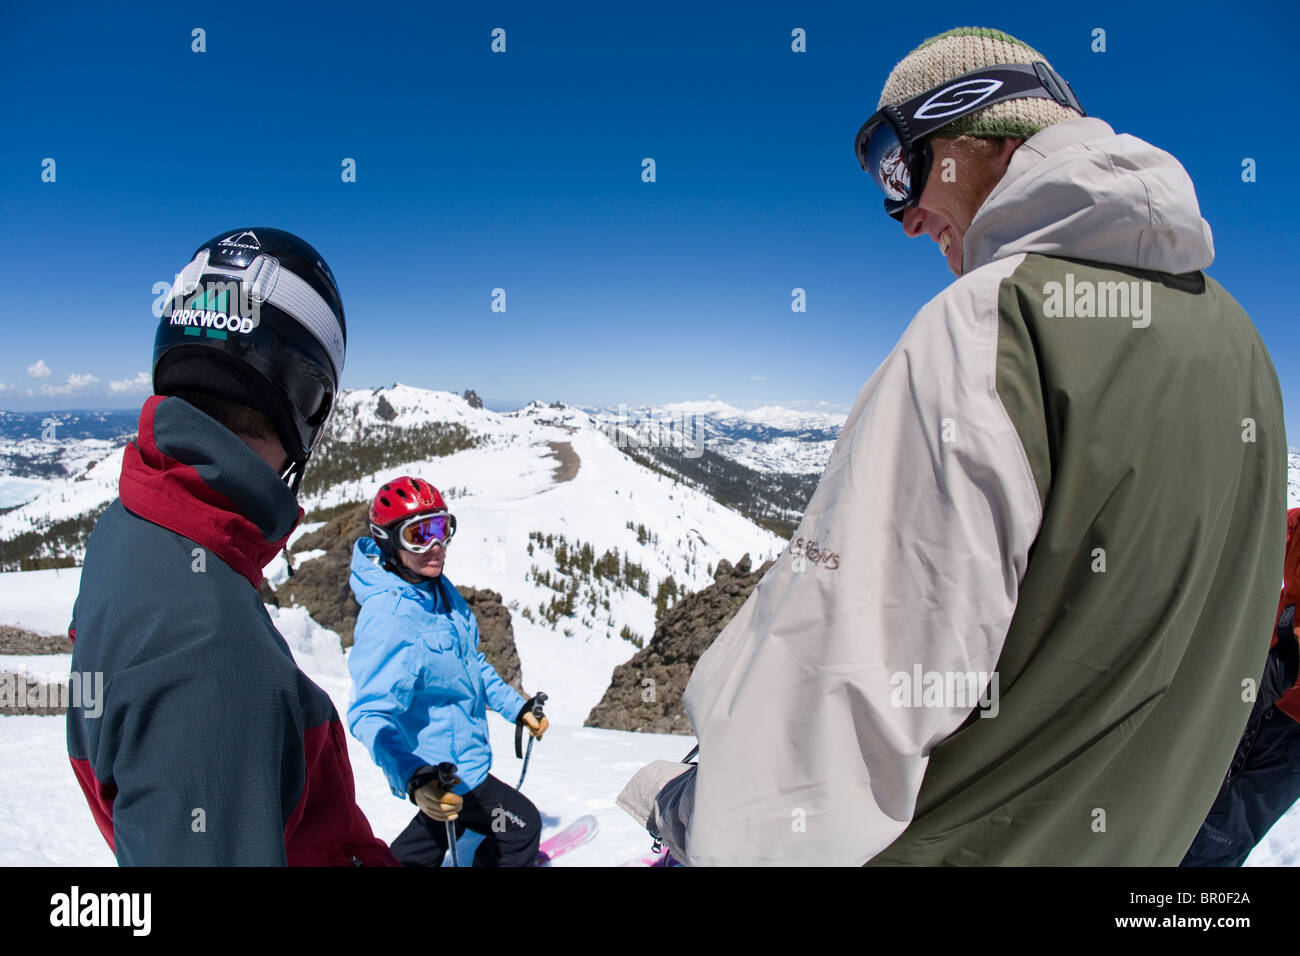 Group of skiers laughing at Kirkwood ski resort near Lake Tahoe, CA.  (fisheye) Stock Photo